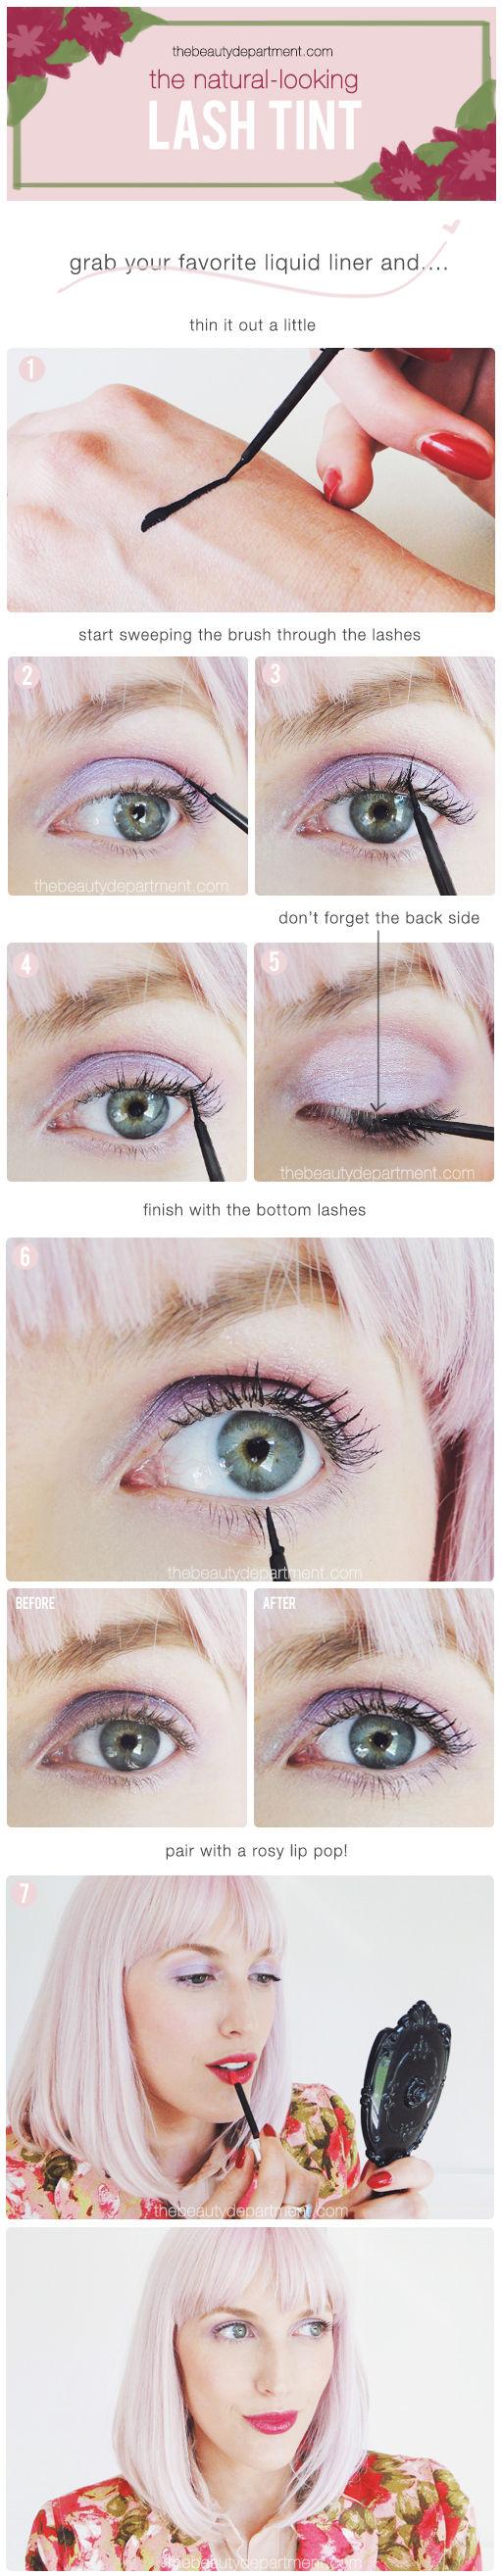 Tutorial truco pintar pestañas con eyeliner líquido